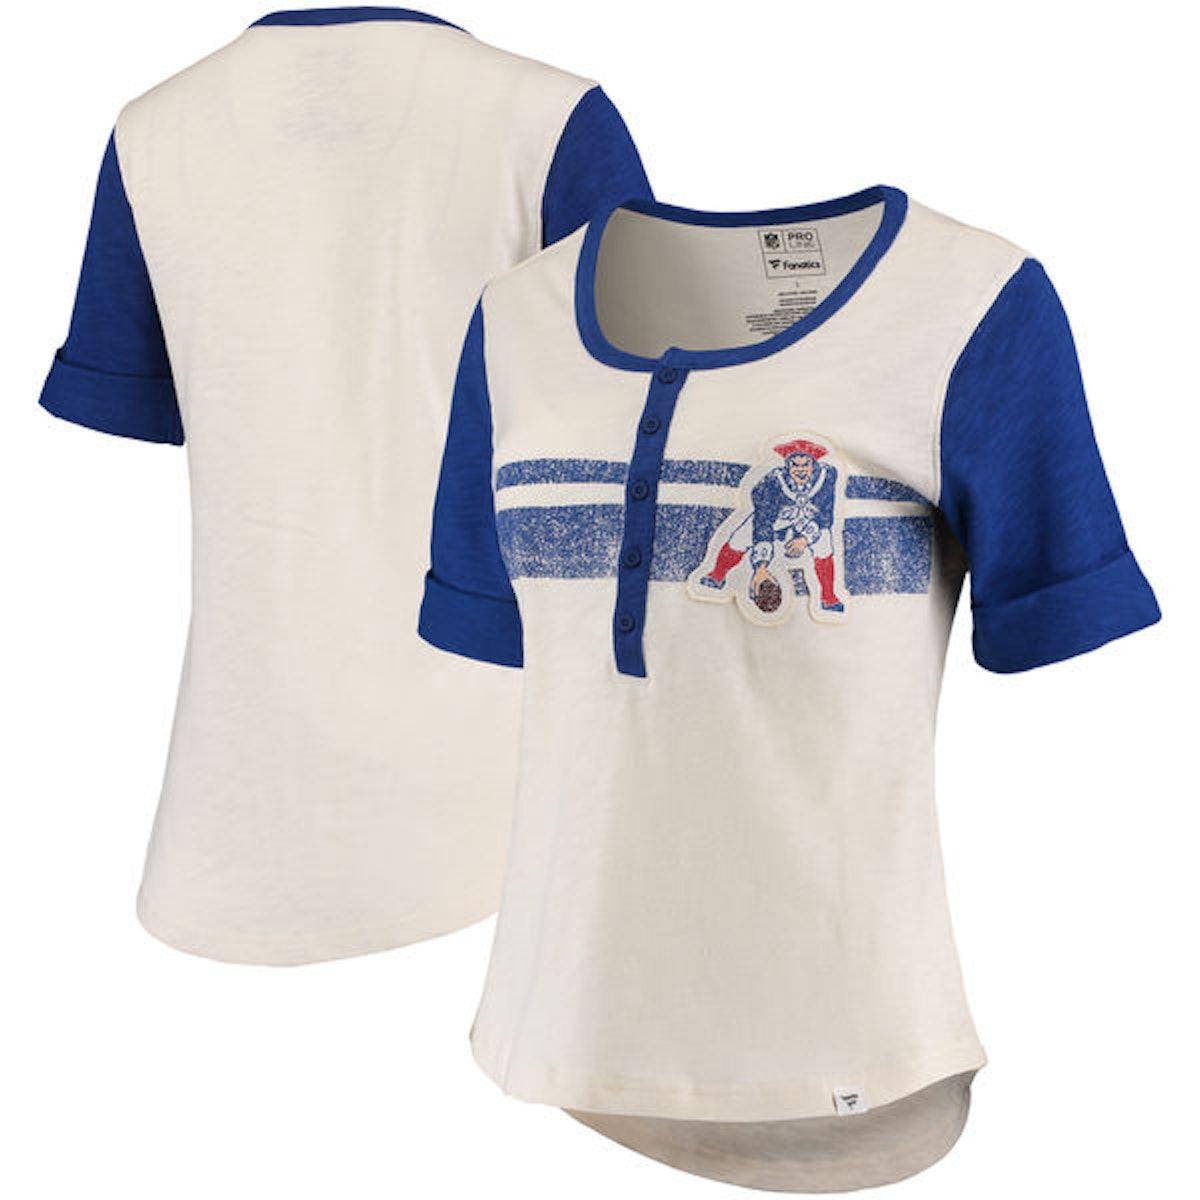 Fanatics Branded New England Patriots Women's White/Royal True Classics Drop Tail Henley T-Shirt